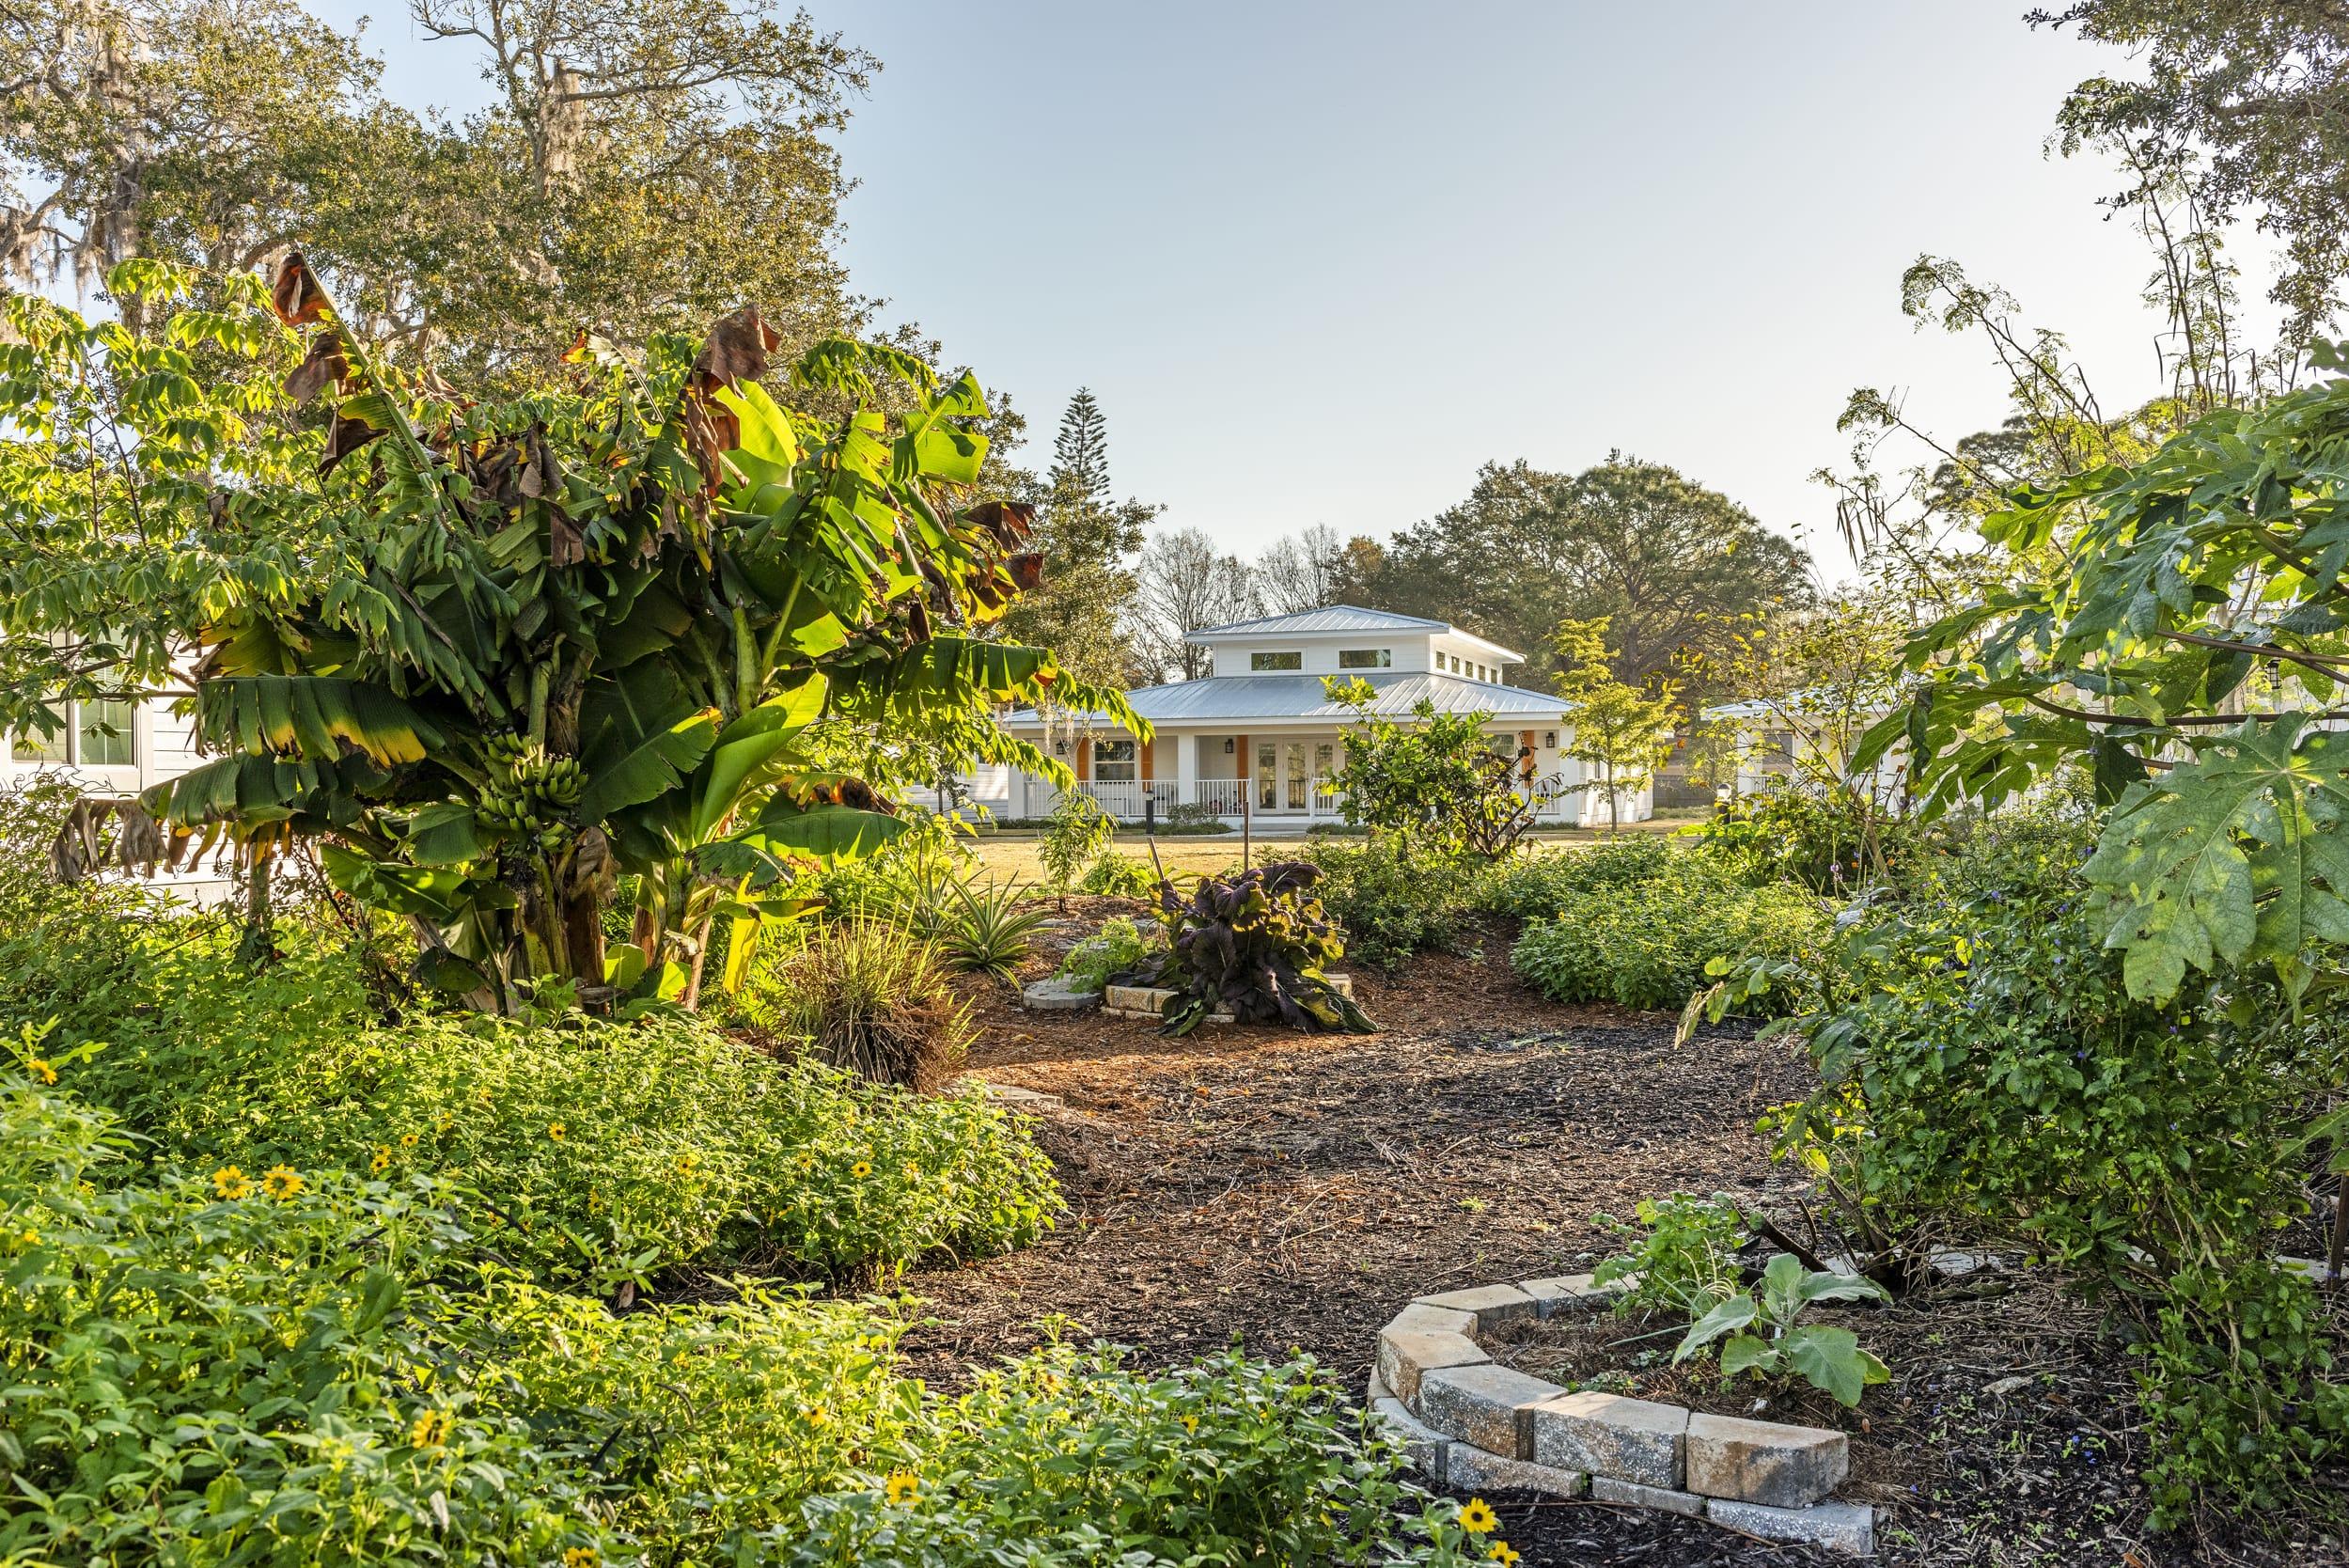 Garden Residential Home